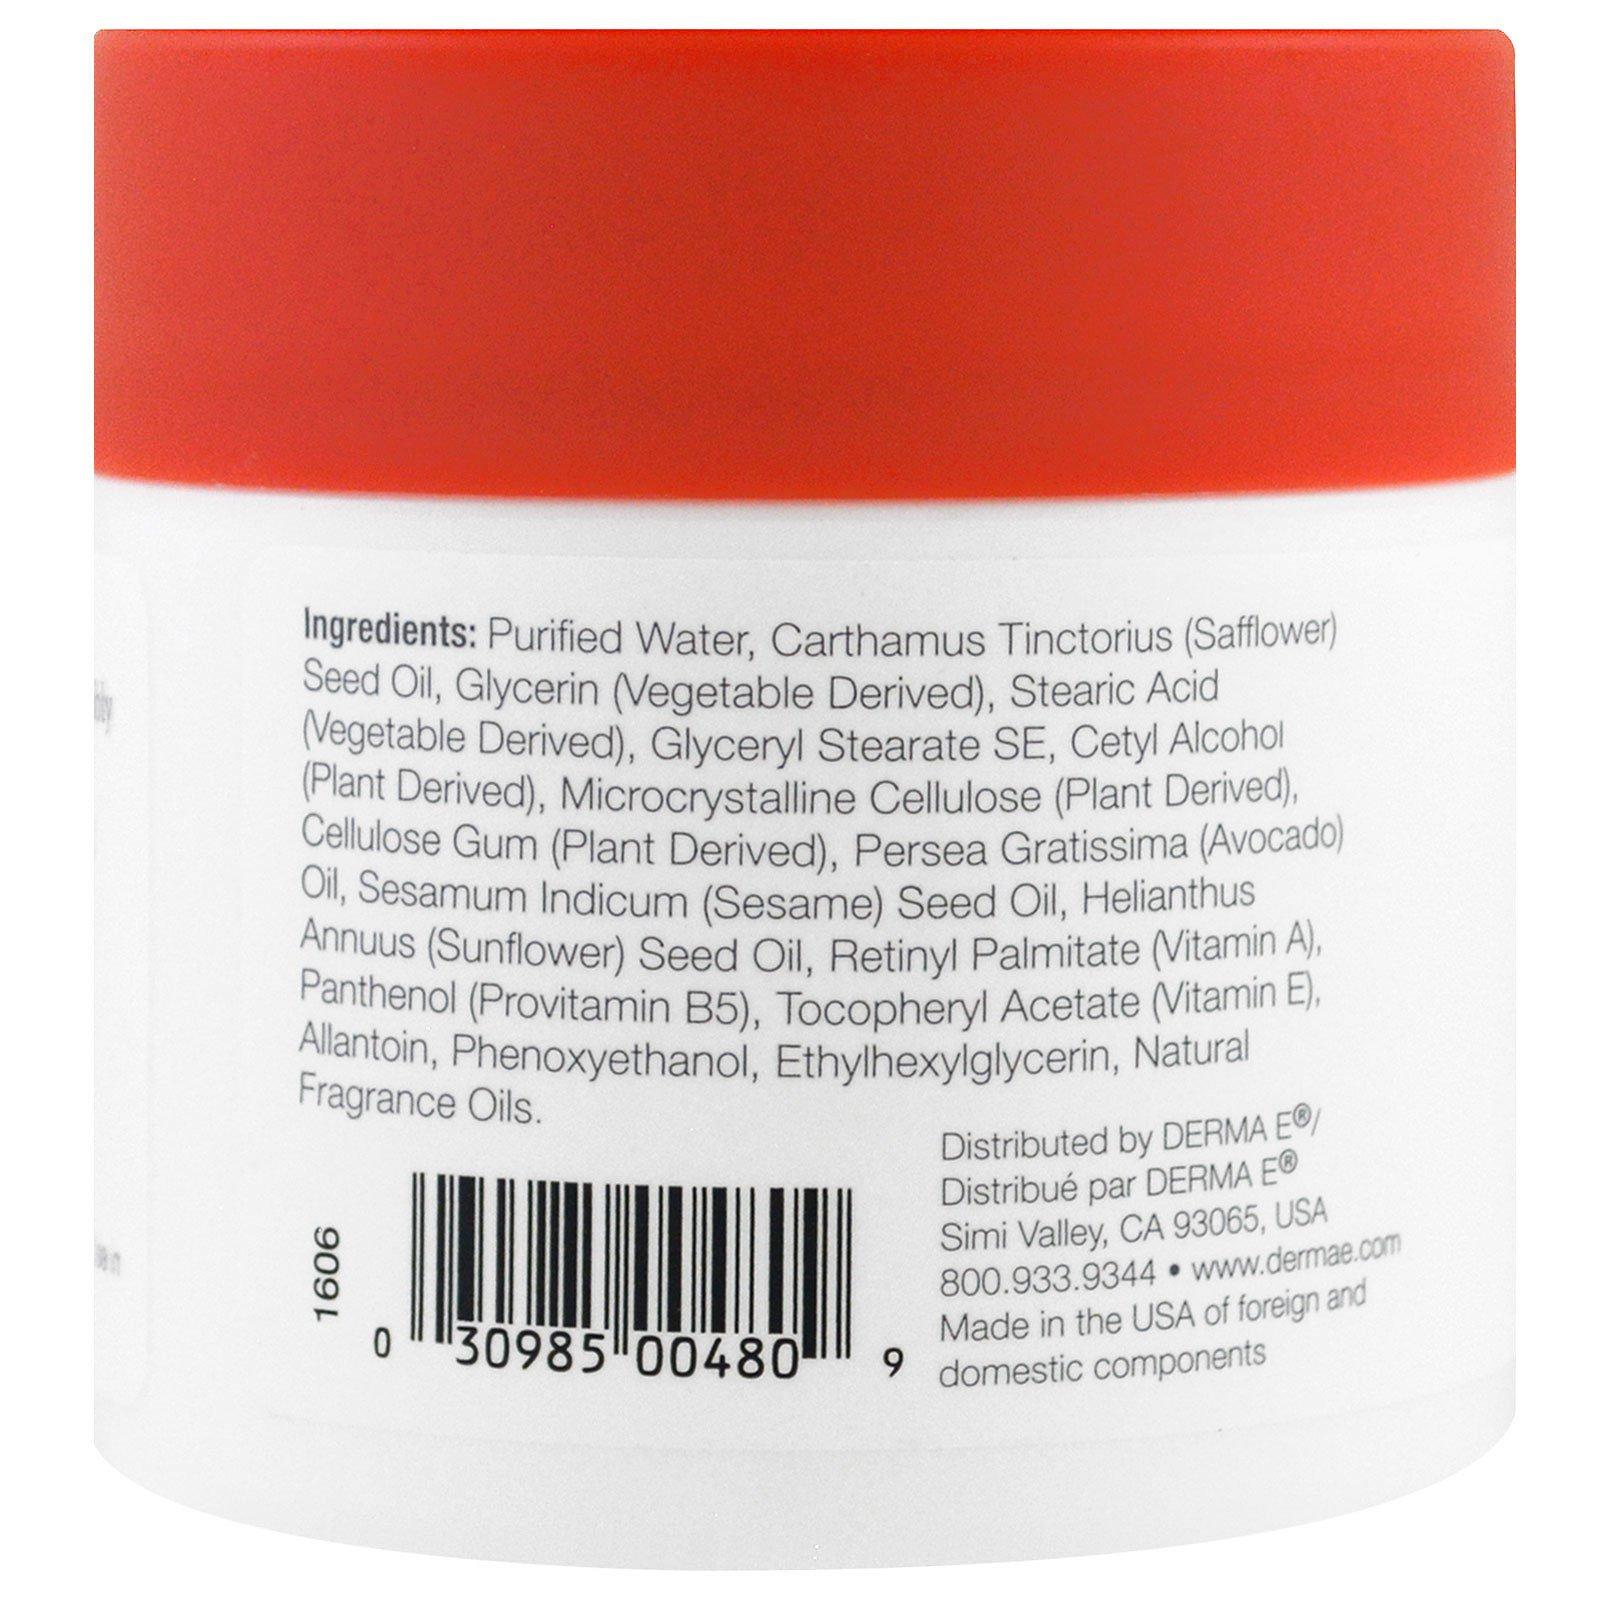 Anti-Wrinkle Renewal Cream - 4 oz. by DERMA-E (pack of 2) 6 Pack - Estee Lauder Idealist Pore Minimizing Skin Refinisher 1 oz